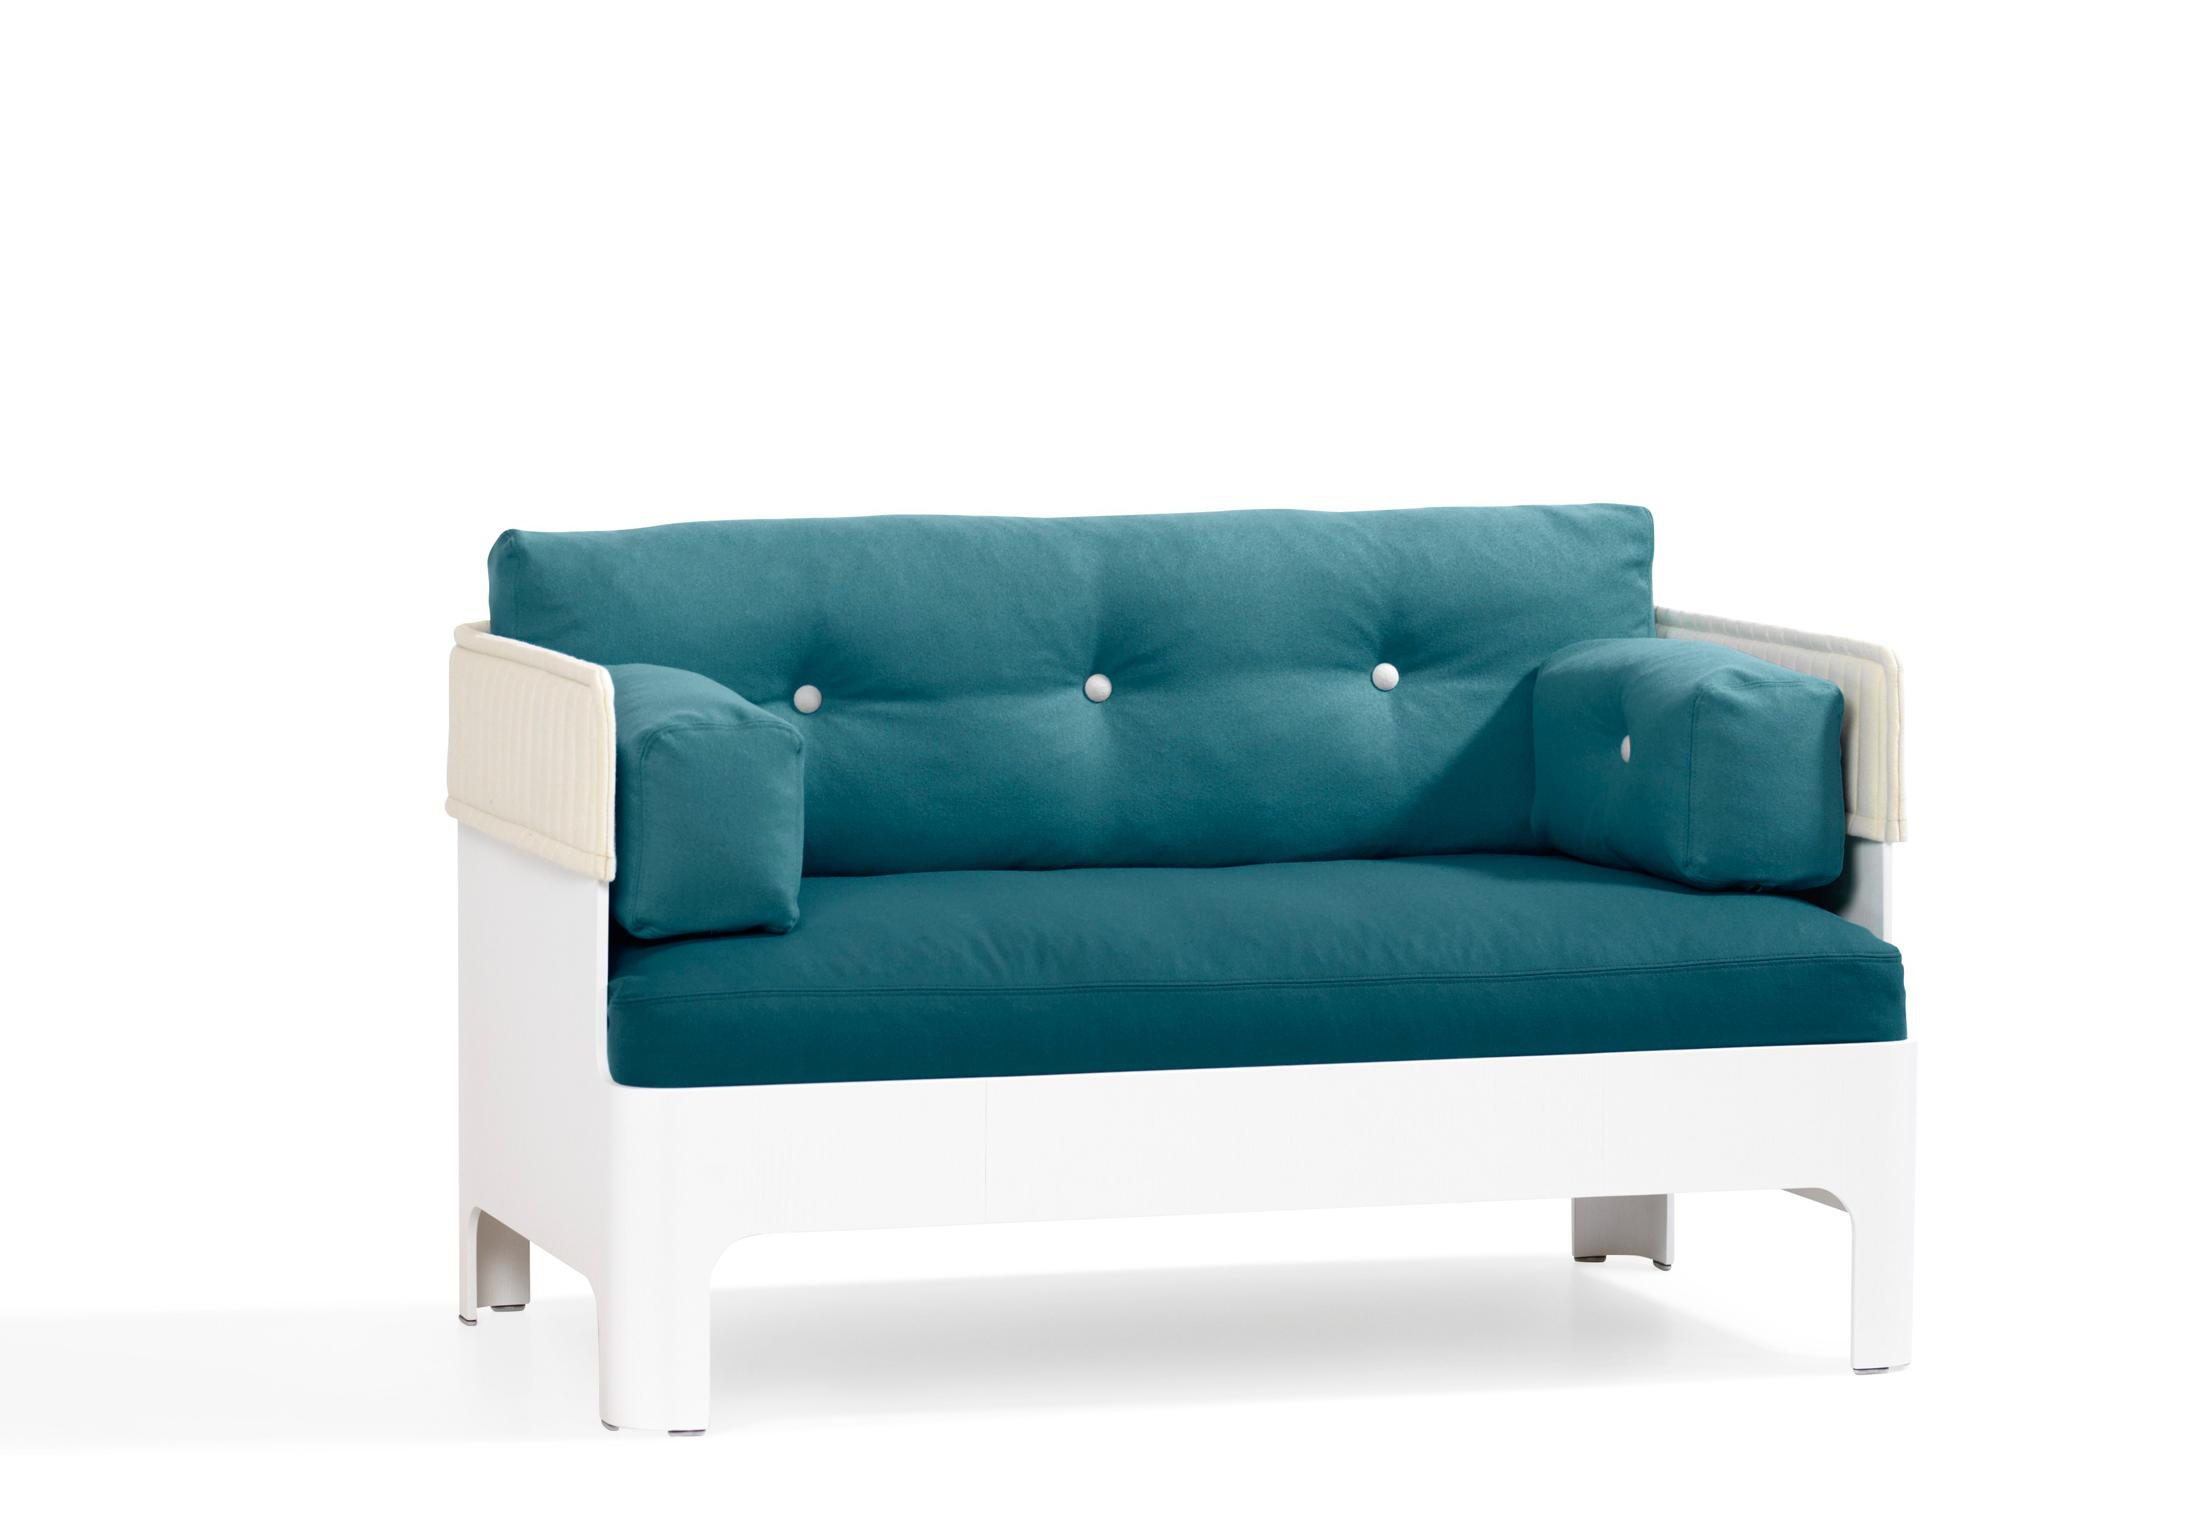 mtl bang big fbx blend sofa low model couch poly furniture cgtrader theory models obj